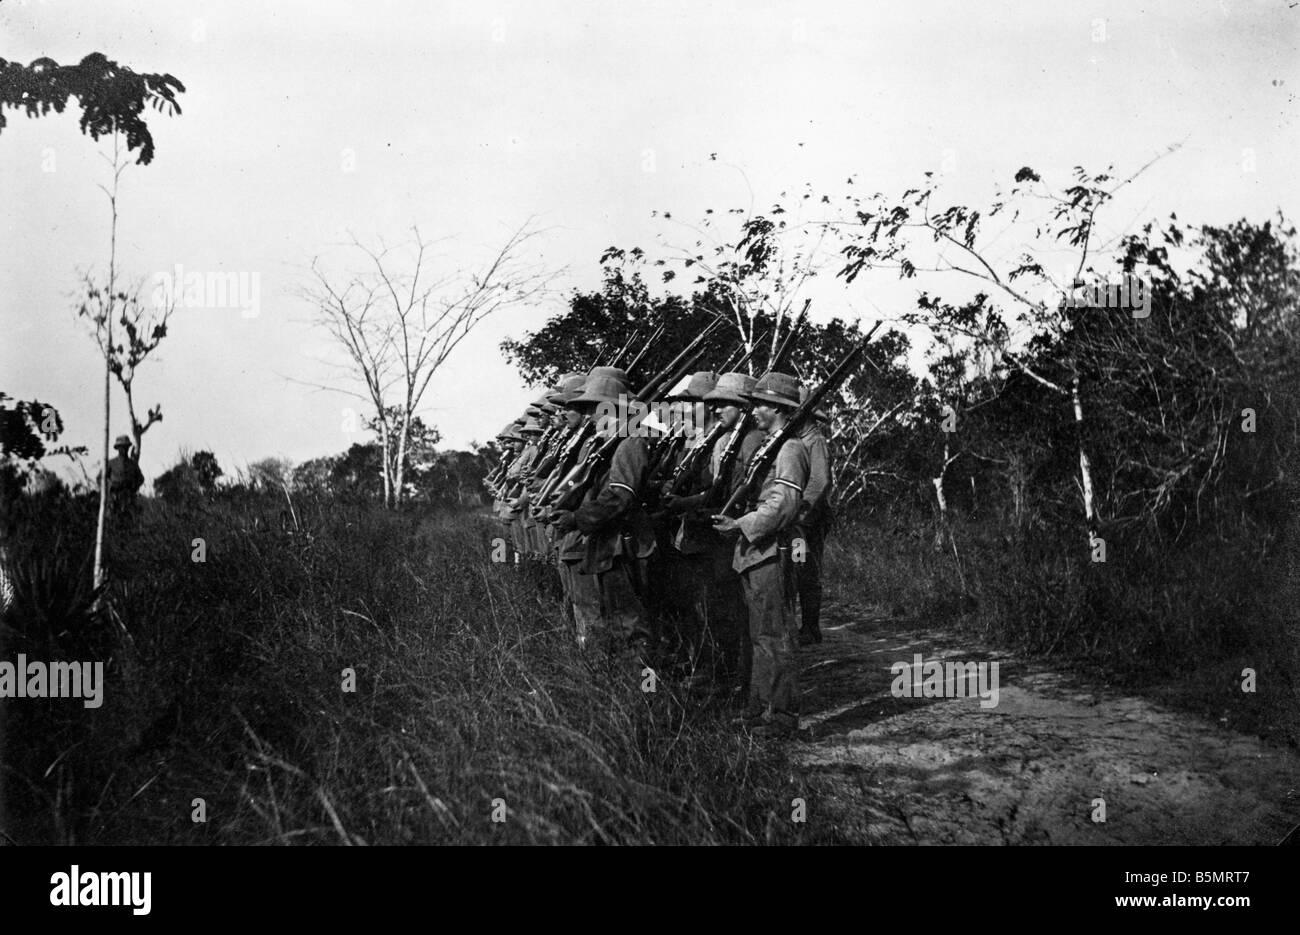 9AF 1914 0 0 A1 8 Esercizio del campo di tedesco orientale truppe Af Guerra Mondiale 1 guerra nelle colonie tedesco East Africa Tanzania ora campo Foto Stock